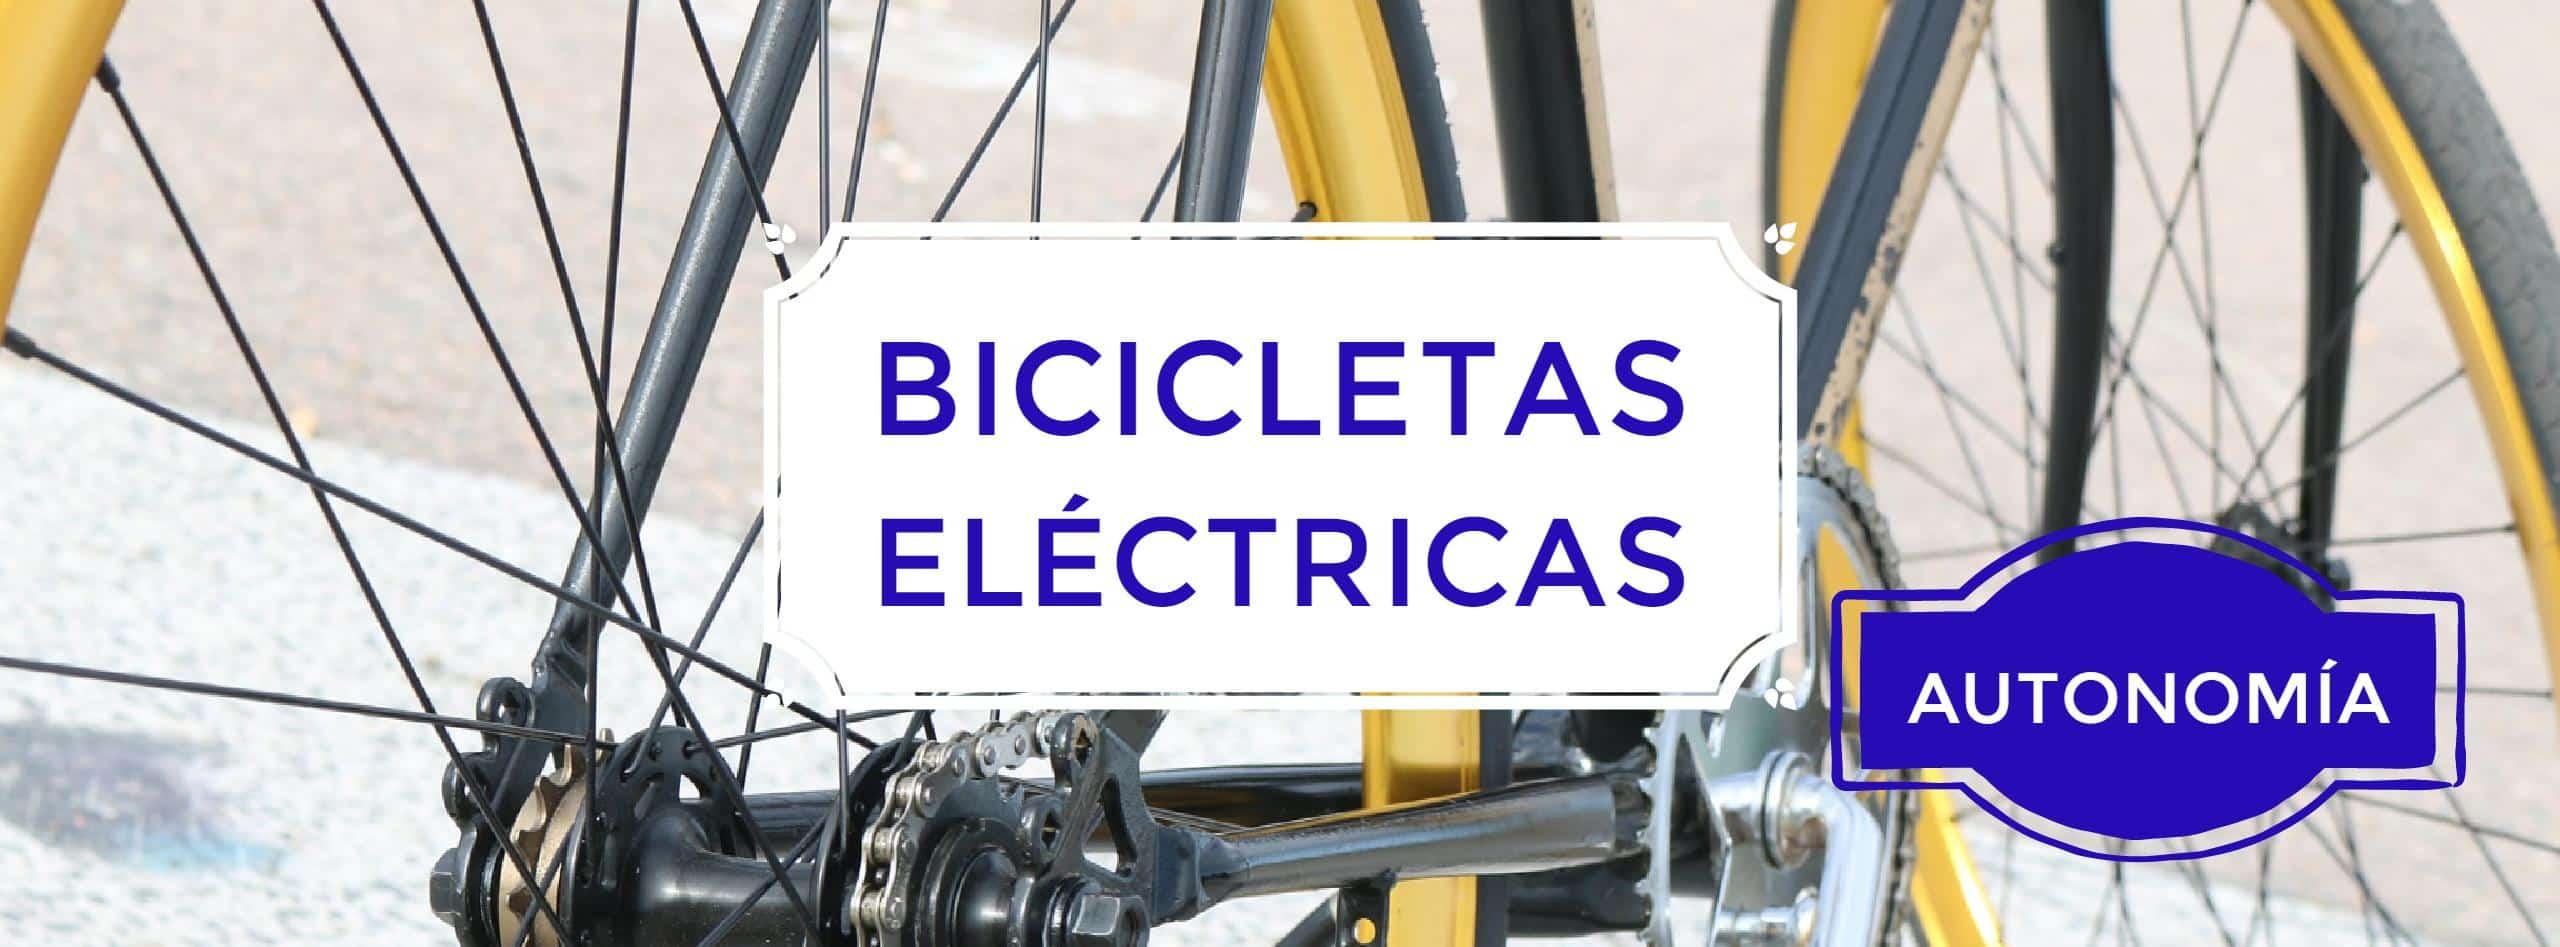 - Bicicletas eléctricas